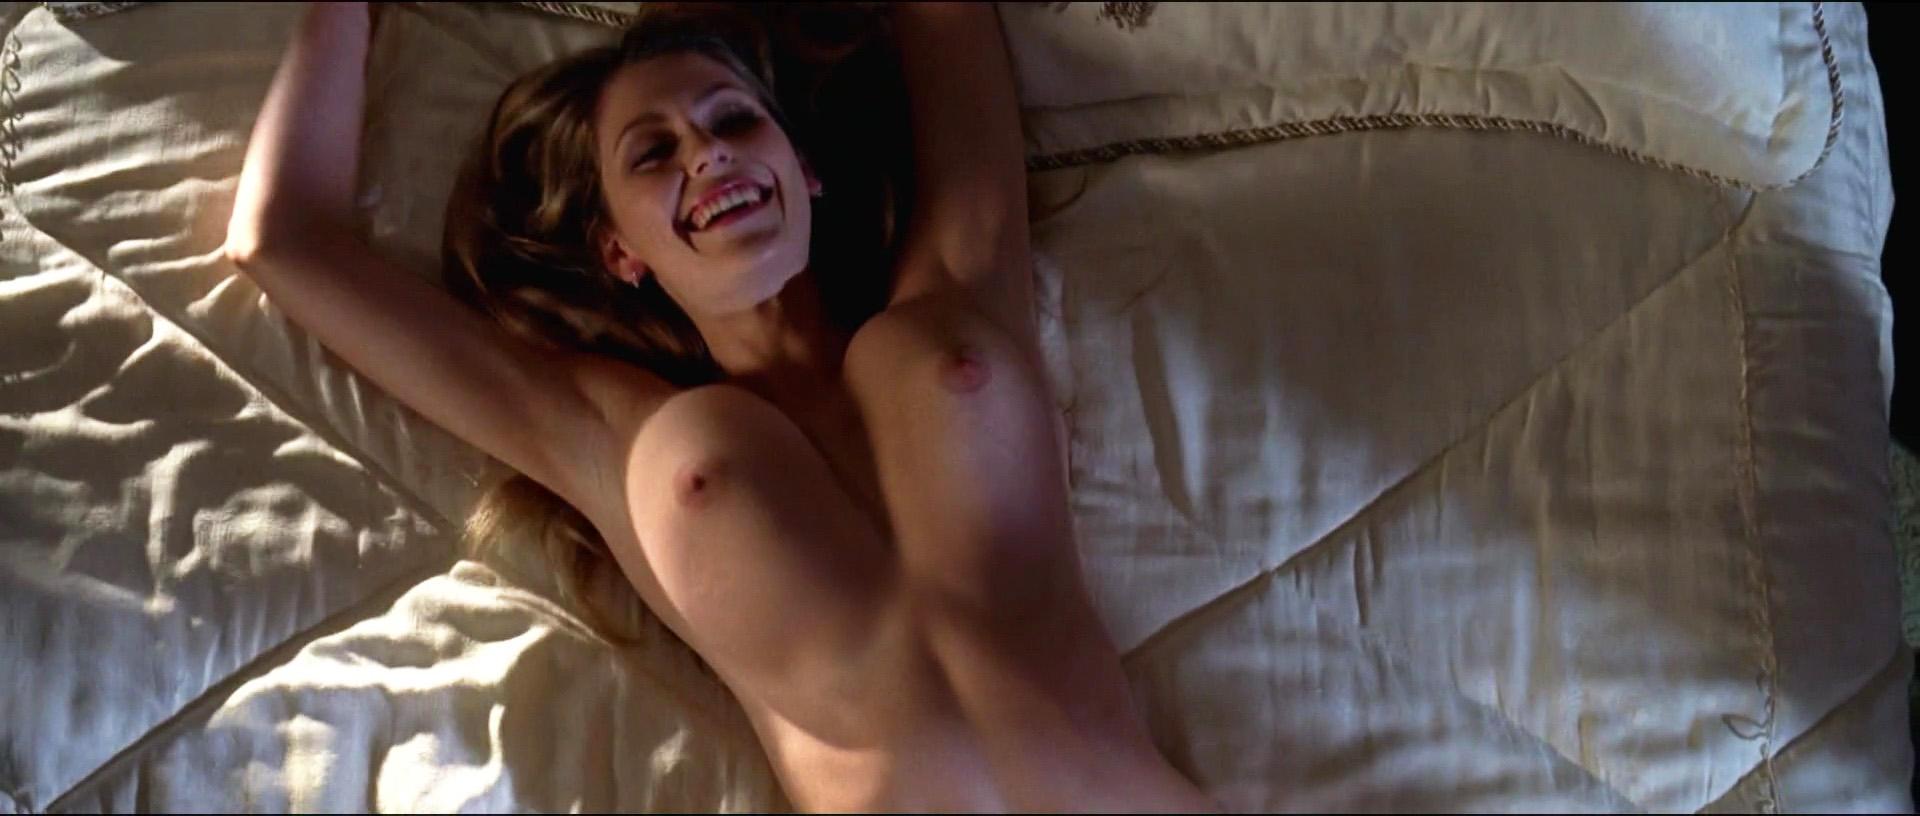 American Pie 3 Nude Scenes wedding crashers nude scenes » nudecelebvideo - your box of